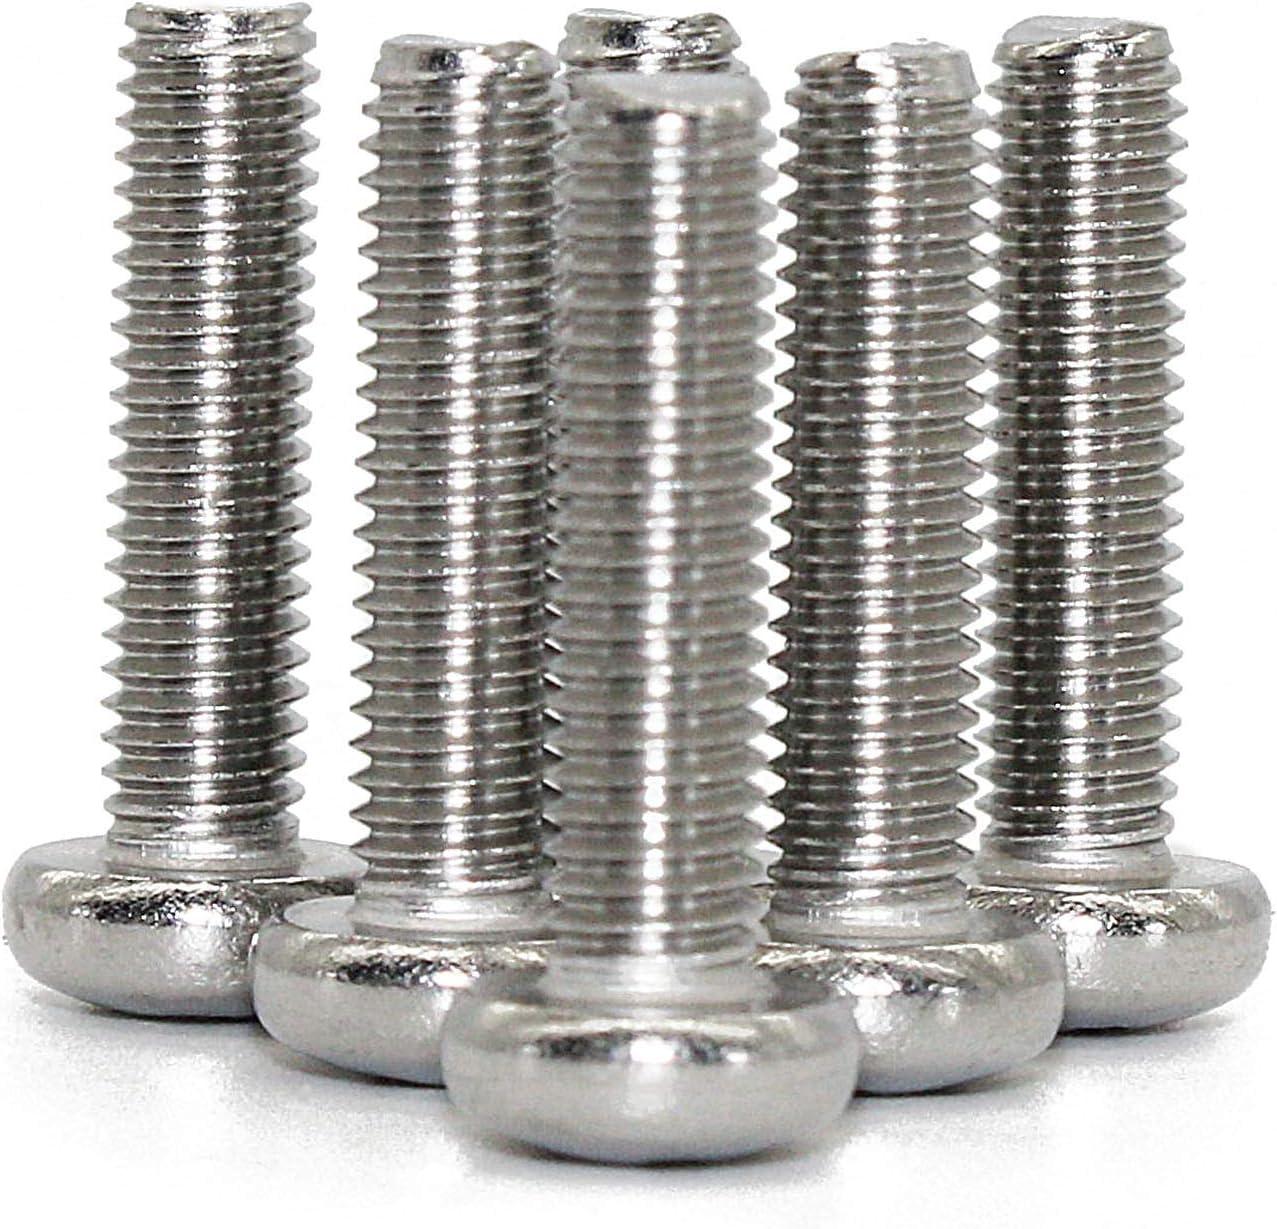 M3-0.5x30 mm Pan Head Phillips Machine Screws,18-8 Stainless Steel by Fullerkreg 100 pc